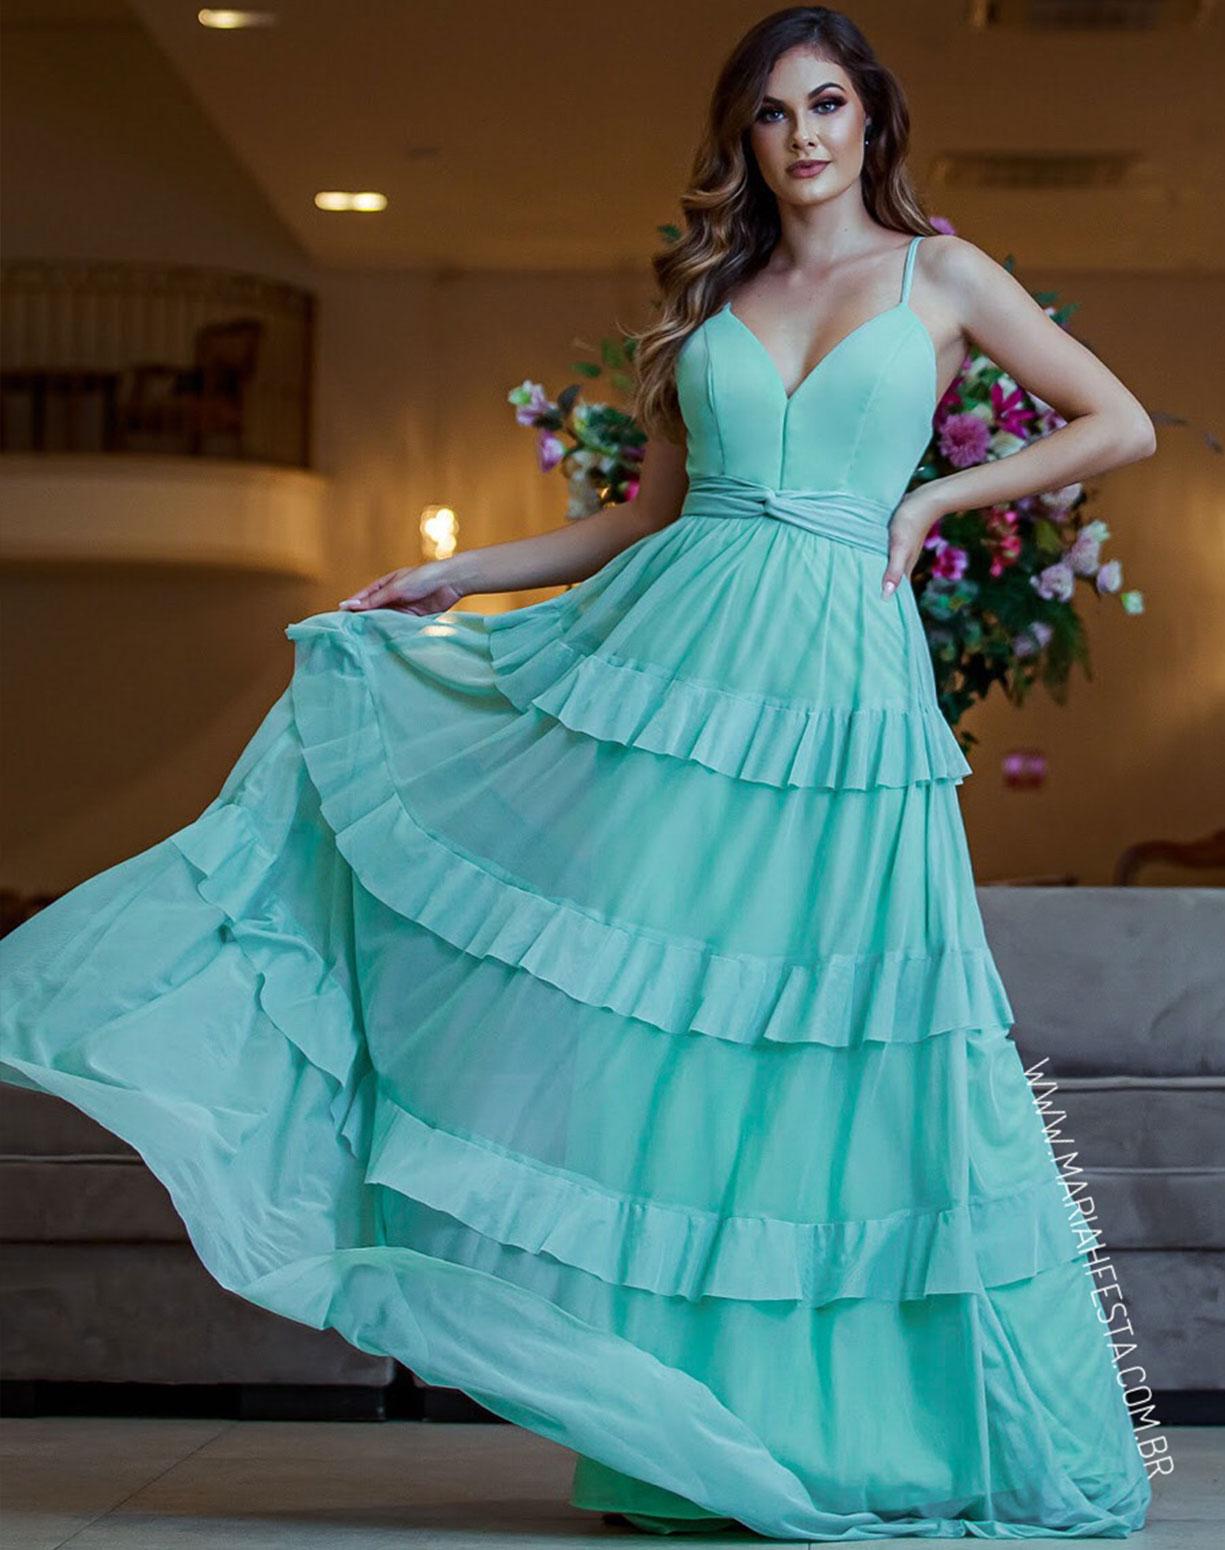 Vestido Verde Menta em Tule de Camadas